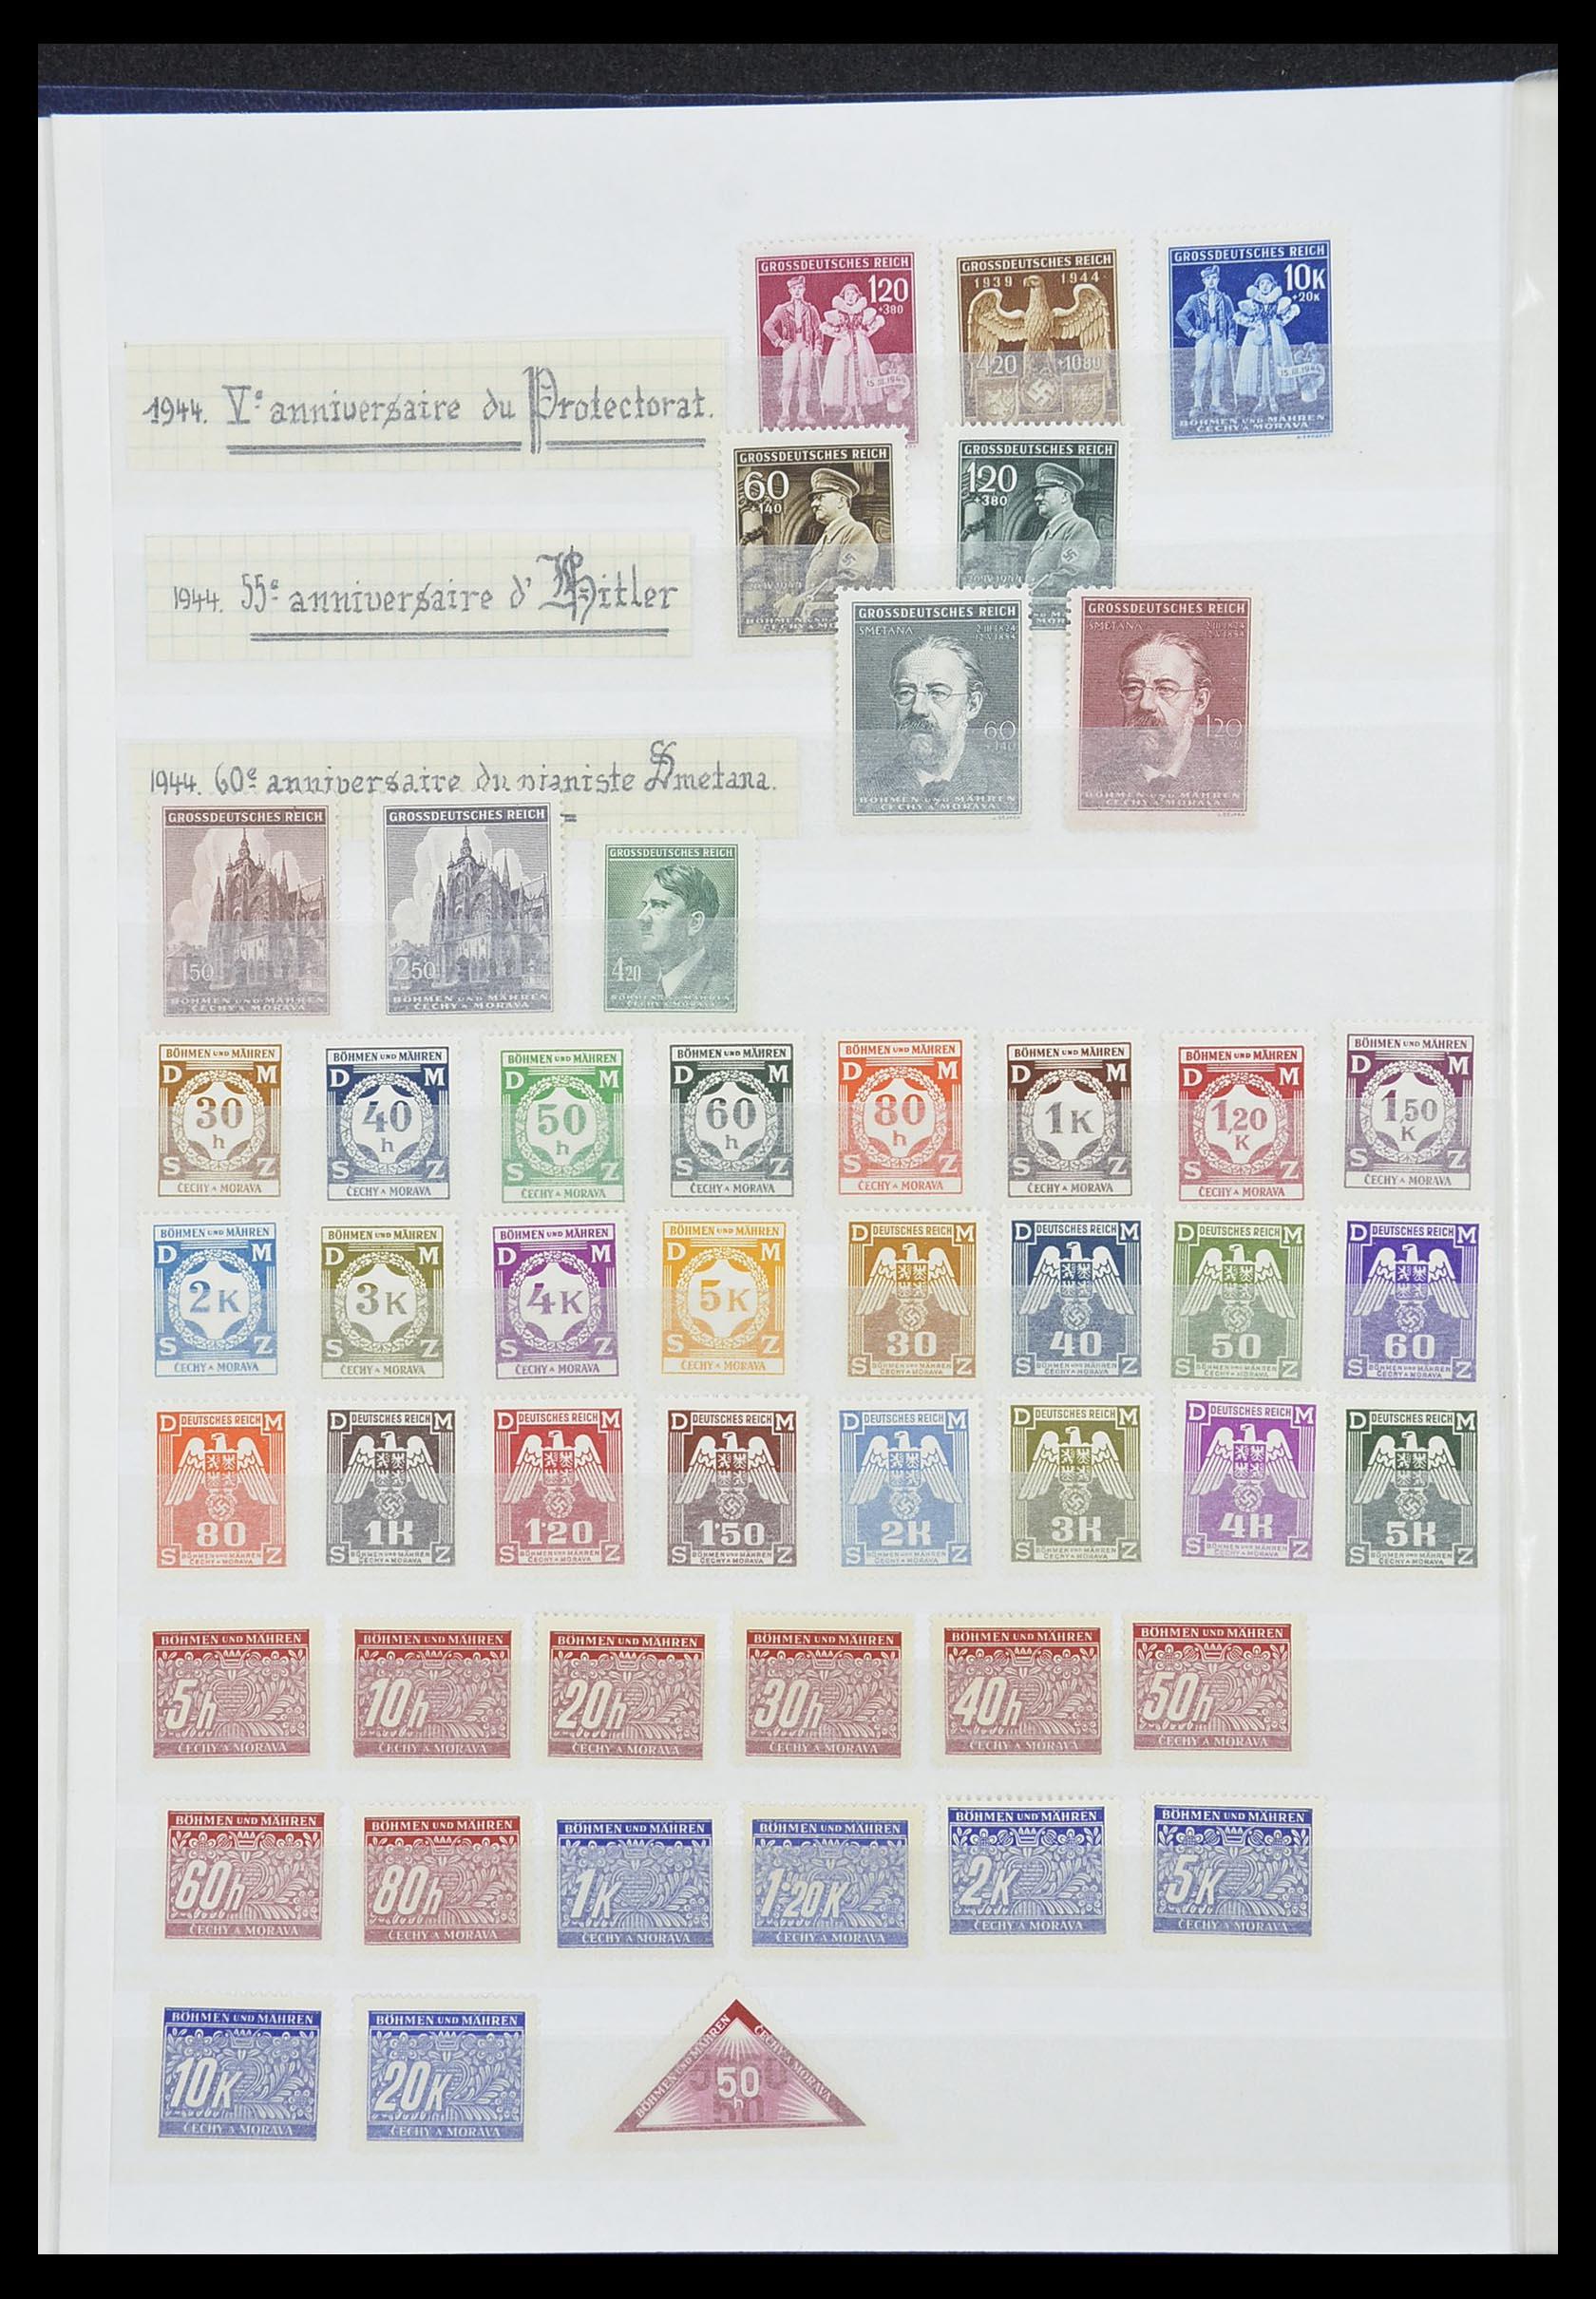 33850 012 - Postzegelverzameling 33850 Duitse bezettingen 2e wereldoorlog 1939-19